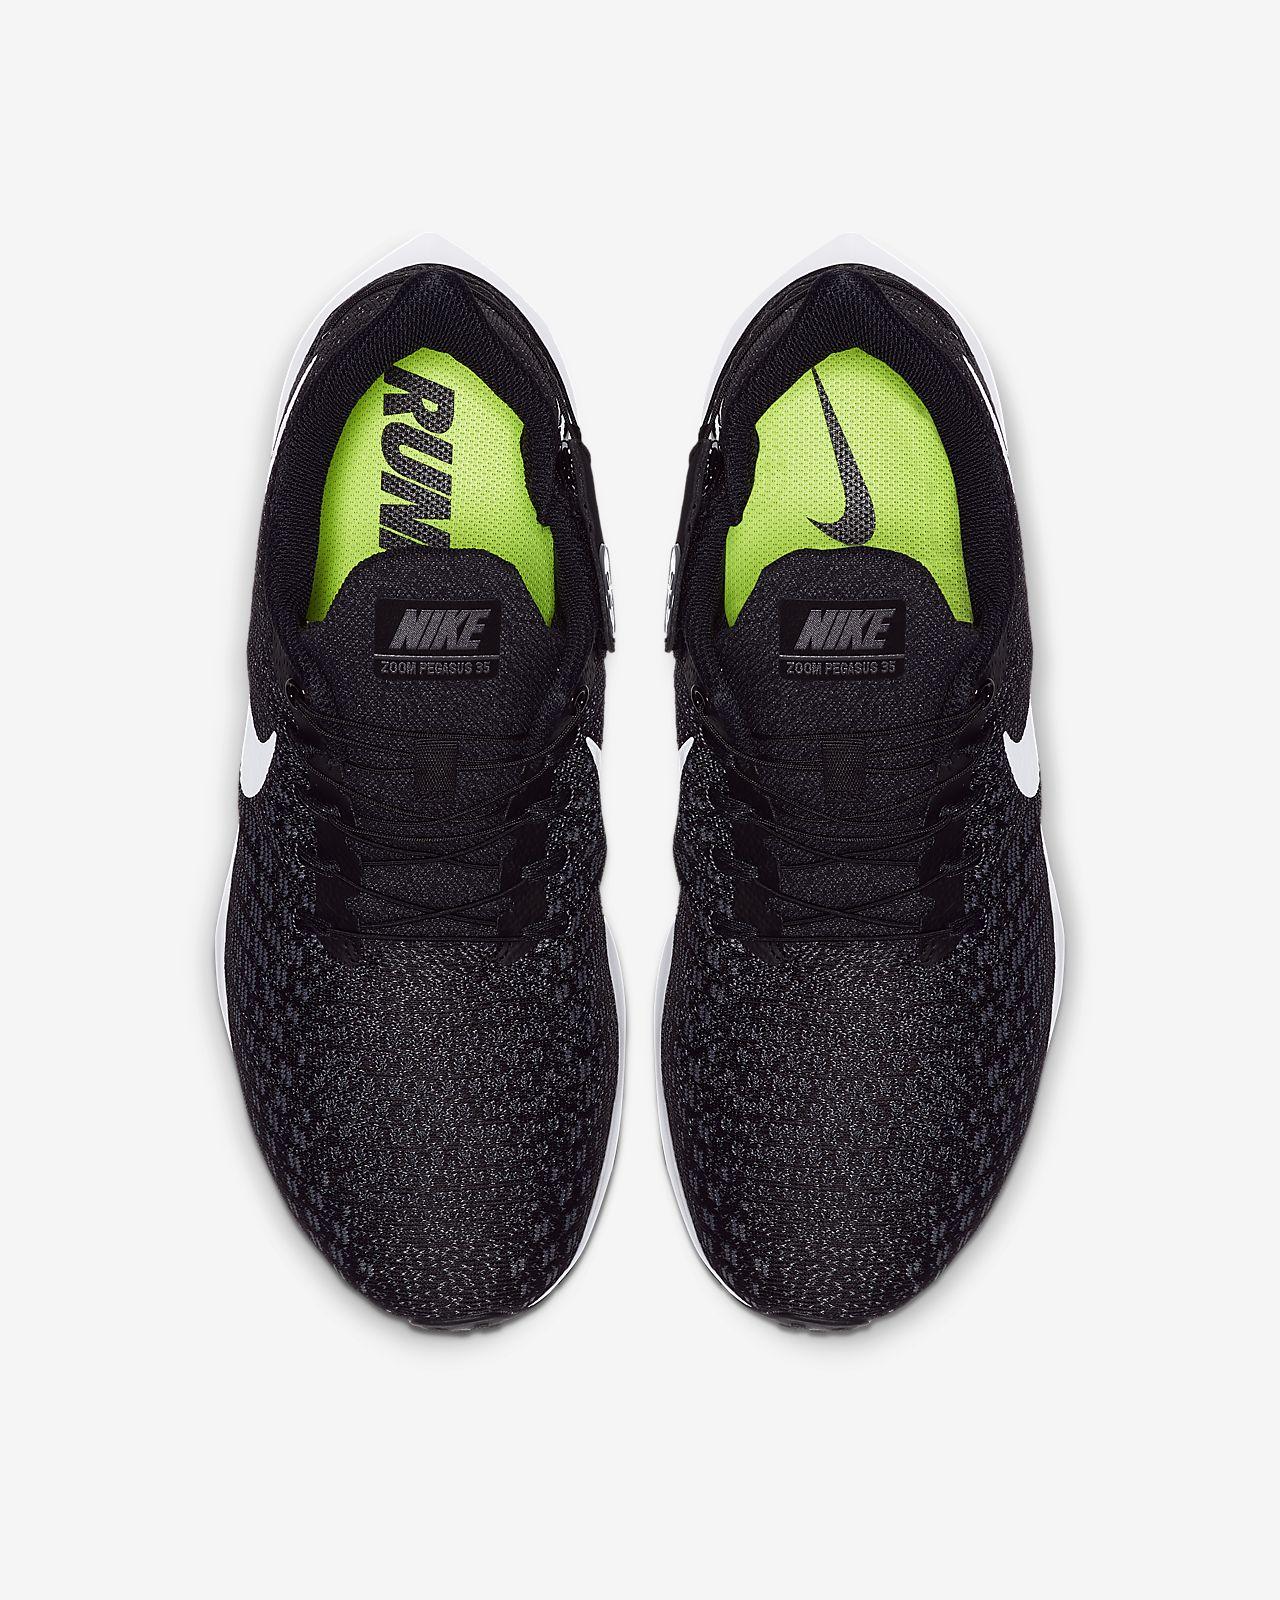 uk availability f7ad9 47310 Nike Air Zoom Pegasus 35 FlyEase 4E Hardloopschoen voor heren. Nike ...